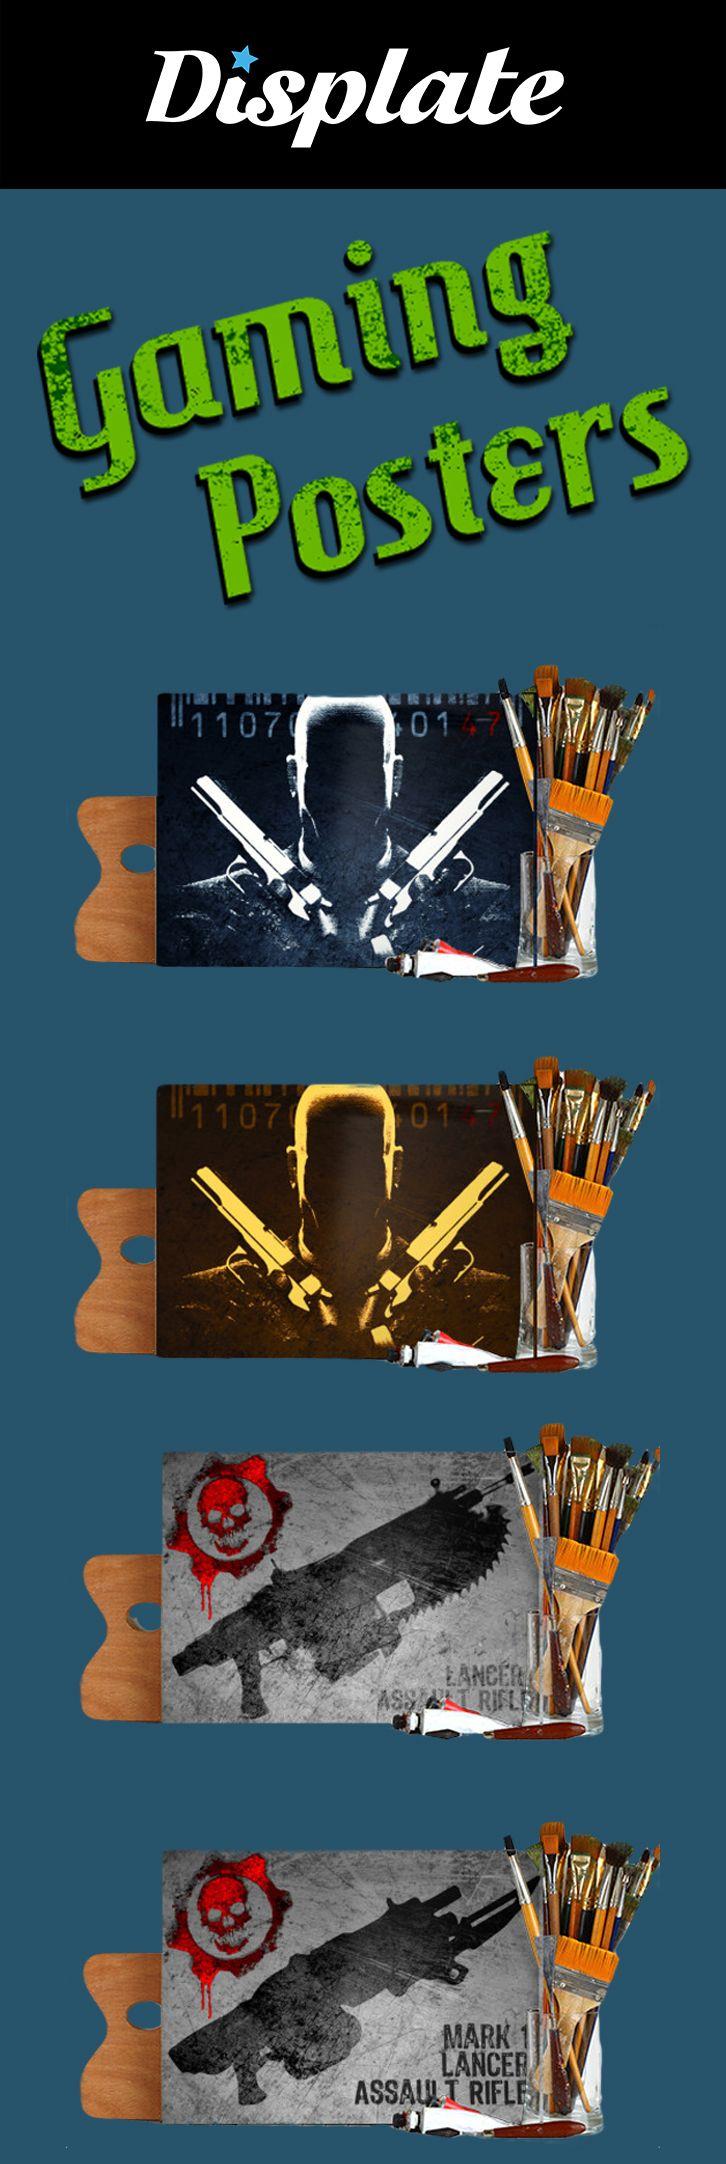 15% OFF any order placed Today 28-4-2017 with code: rottweiler #gaming #discount #sales #save #discountgaminggifts #fantasy #zelda #game #poster #geek #nerd #halftone #home #decor #mancave #kids #Illustration #geekgifts #nerdgifts #gamer #gamingposters #metalprint #gamergifts #displate #poster #kidsroom #zeldafans #legendofzelda #homedecor #homegifts #gamershome